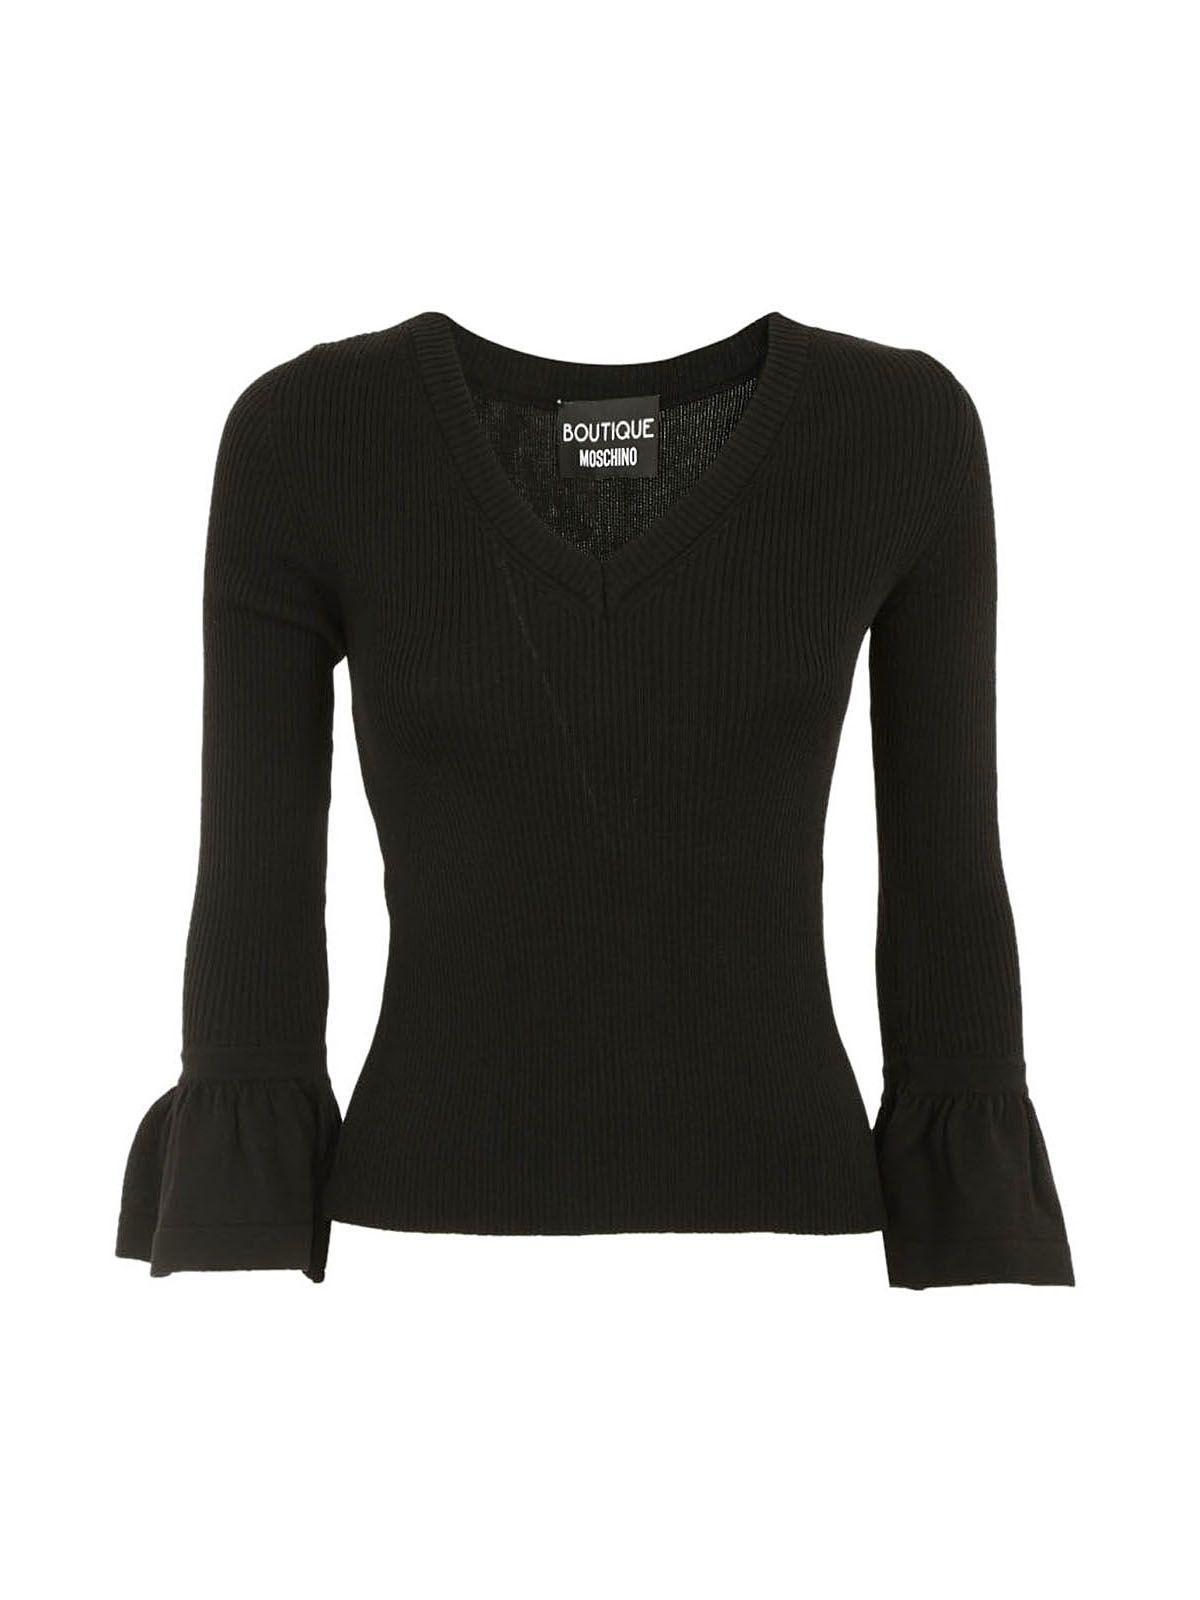 Boutique Moschino Ruffle Sweater